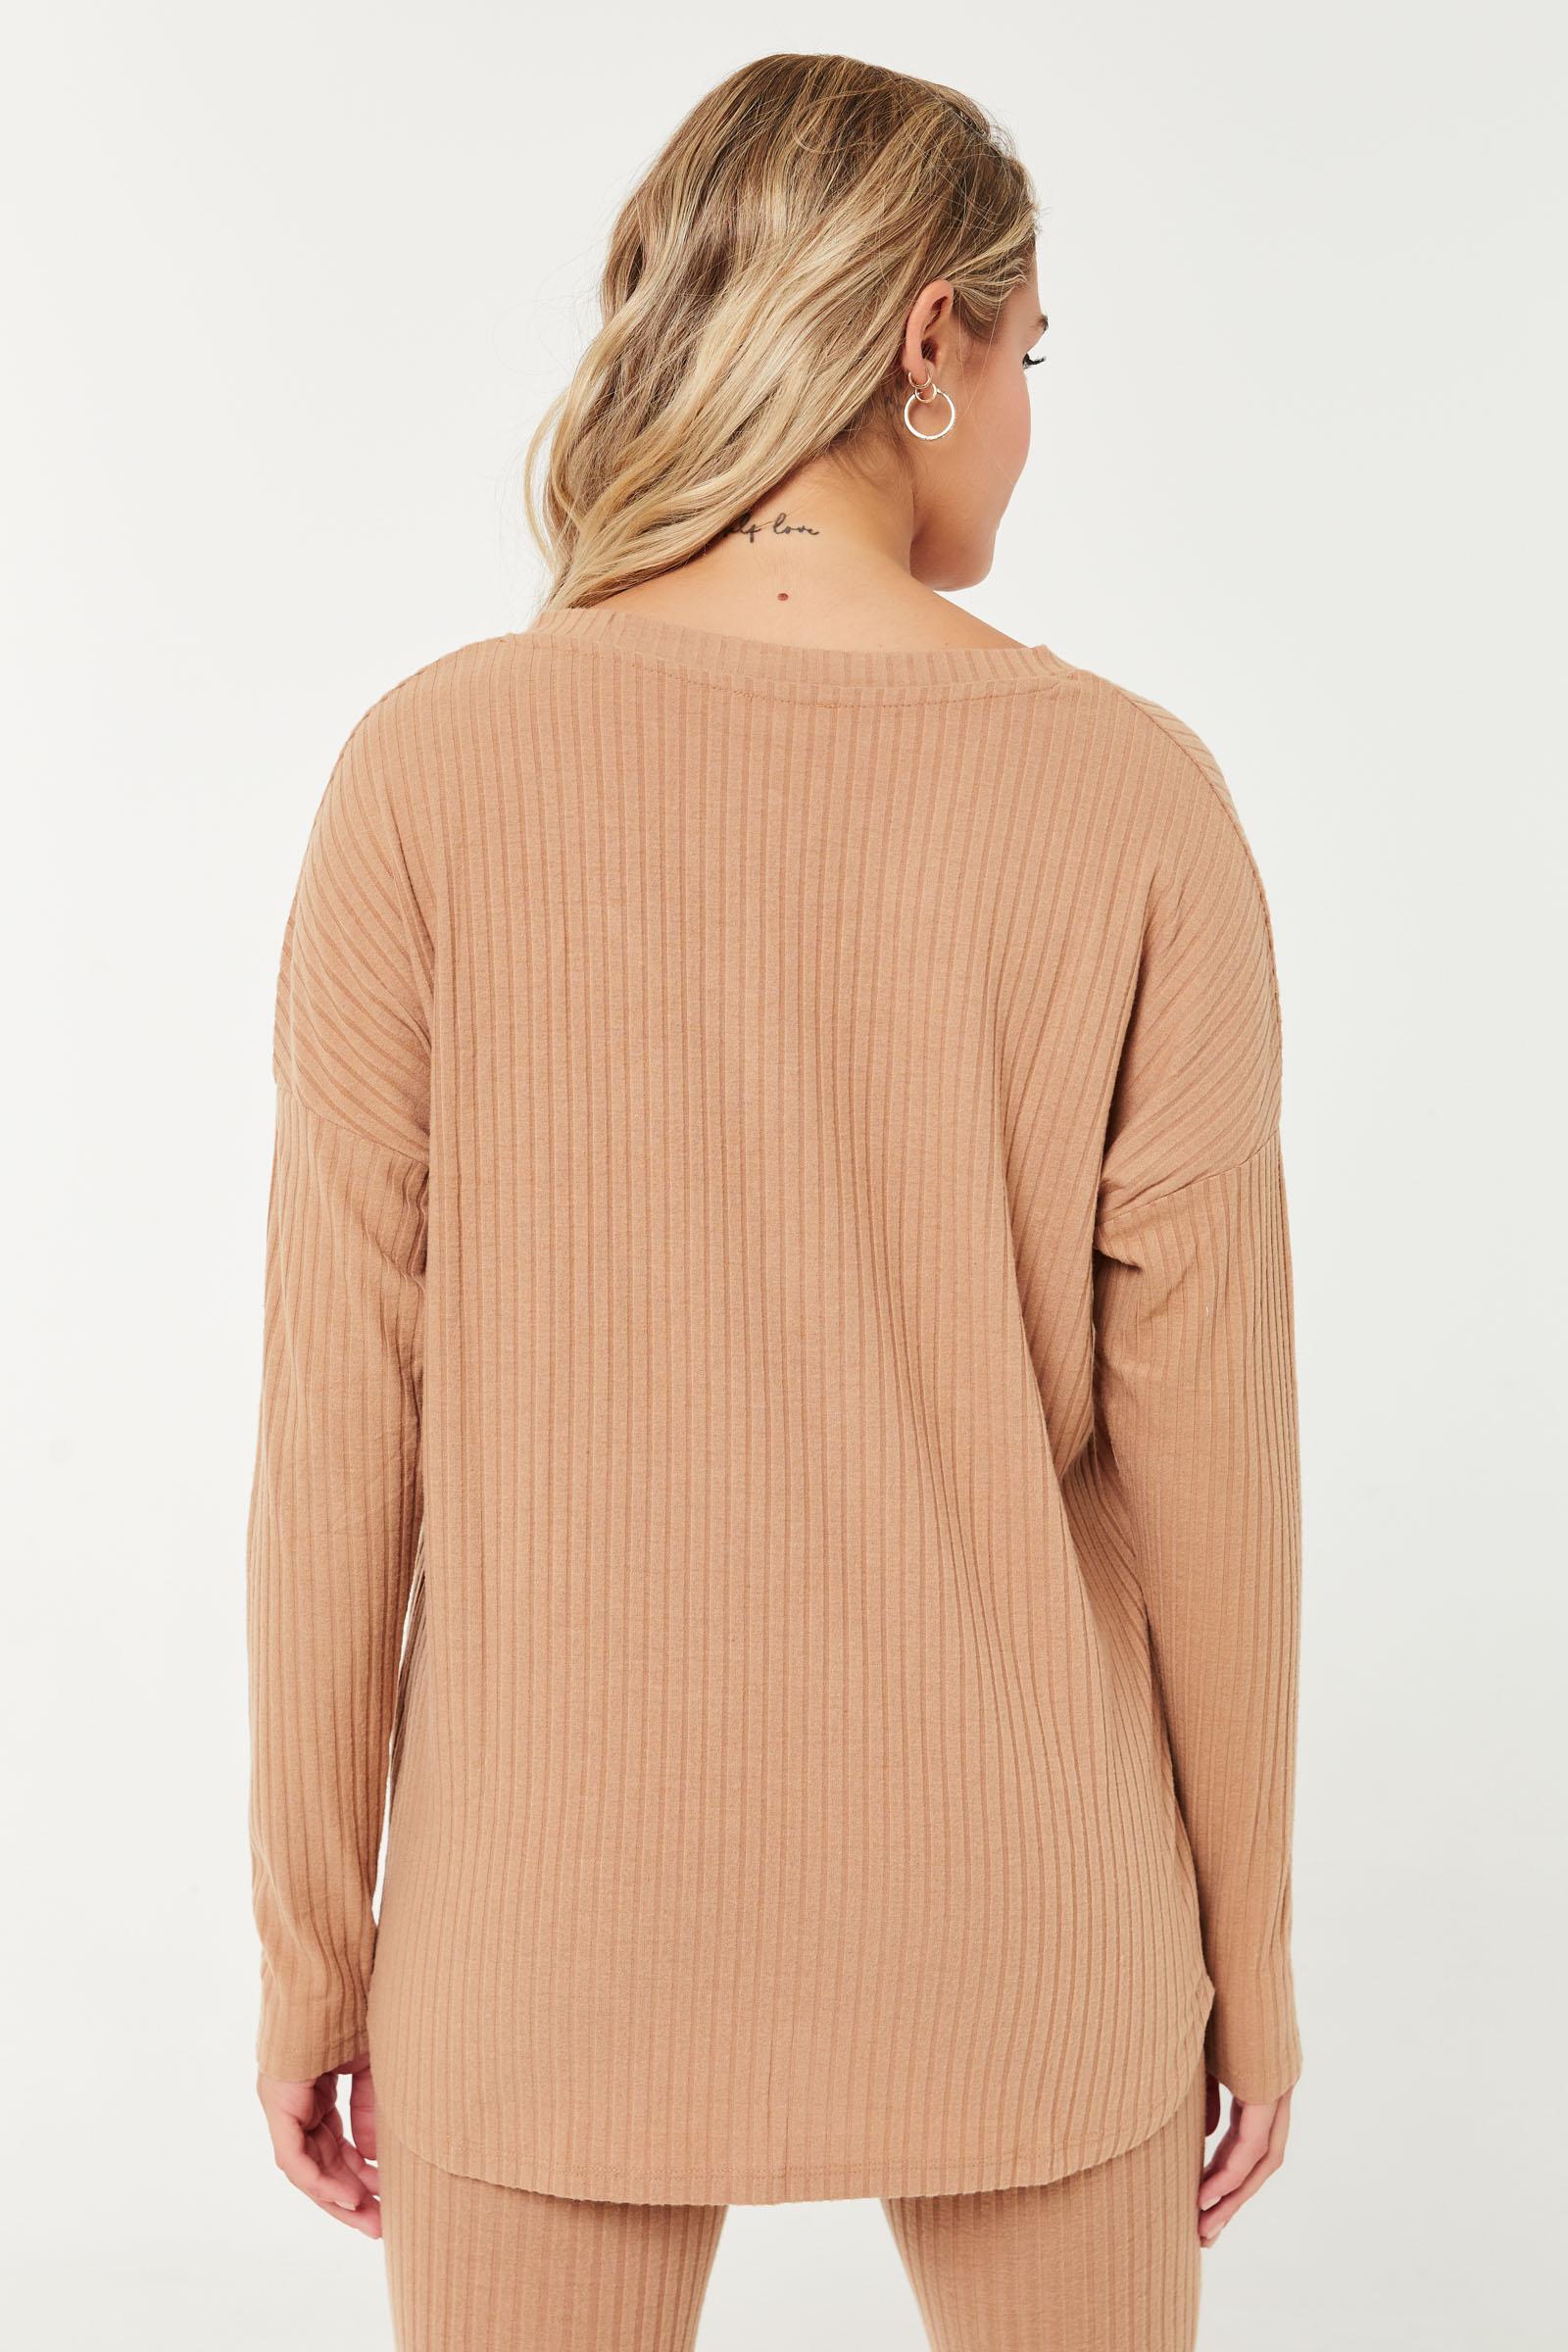 Brushed Ribbed V-Neck Sweater